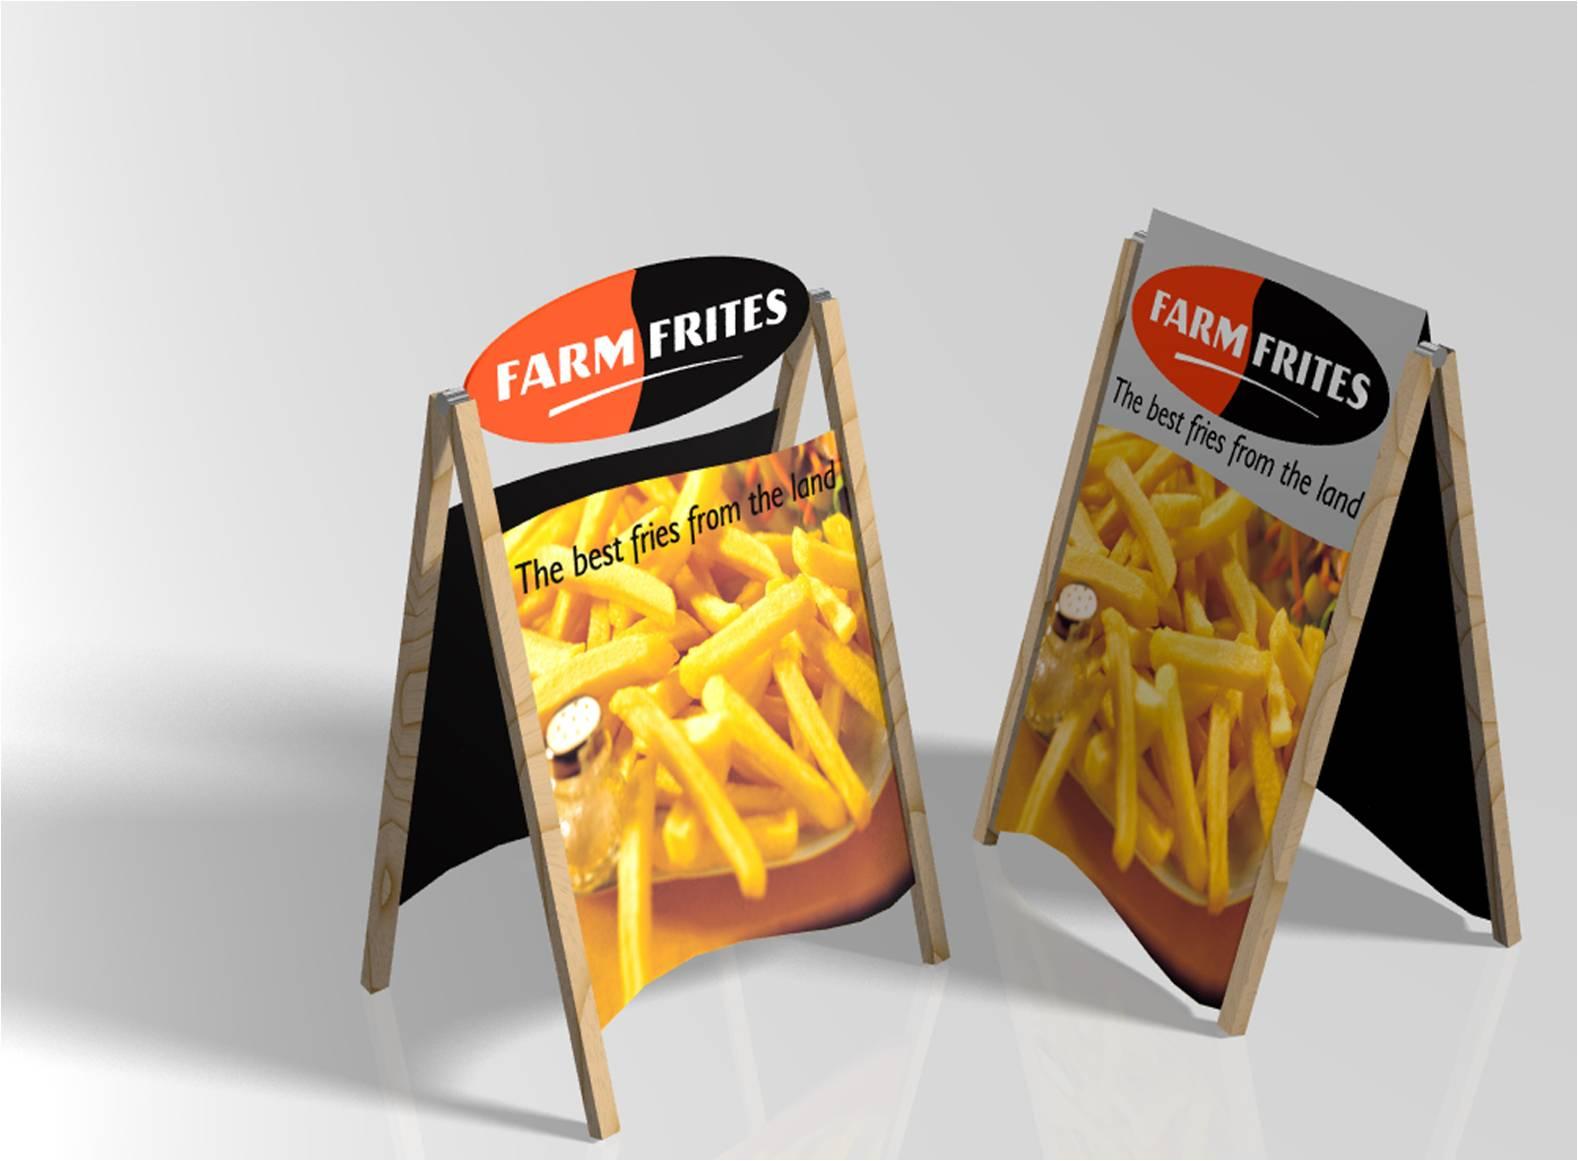 farmfrites-2.jpg